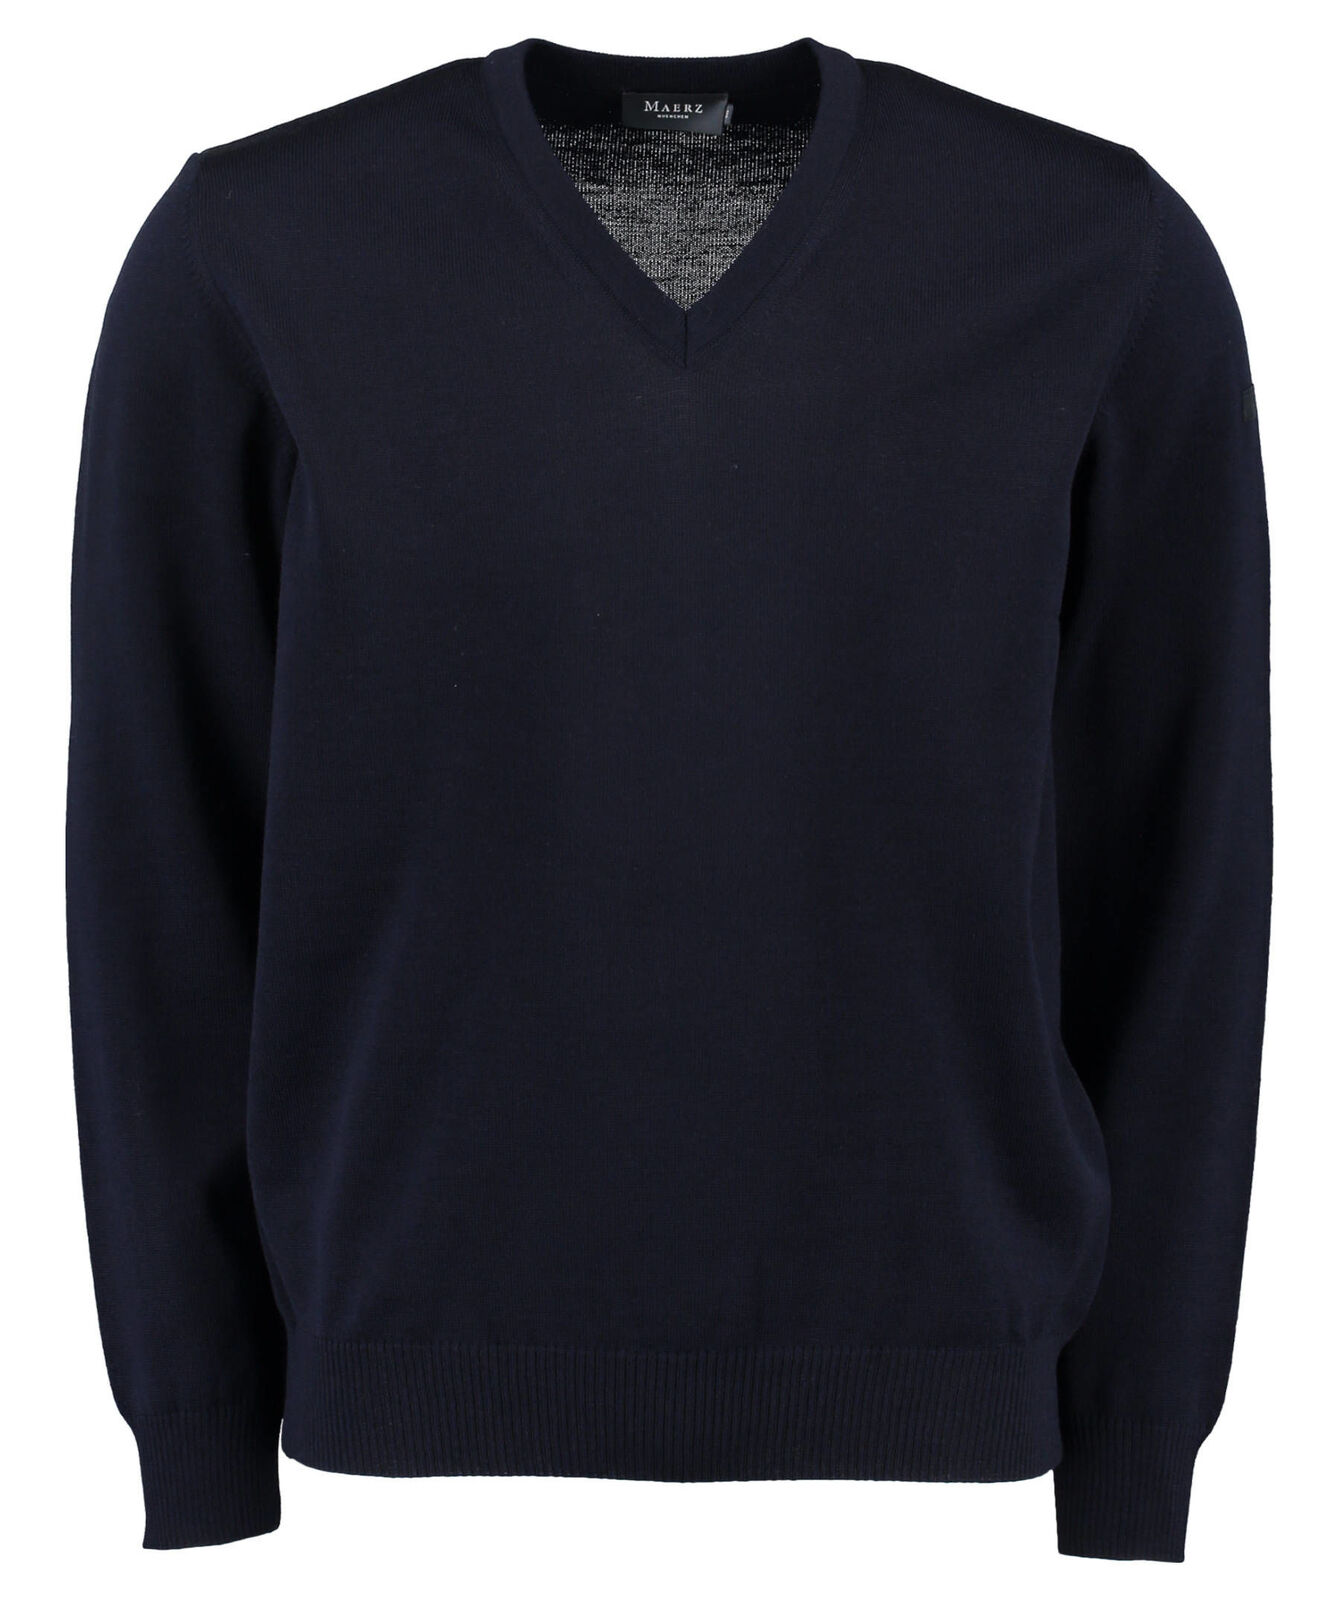 MAERZ Muenchen Herren Pullover NEU